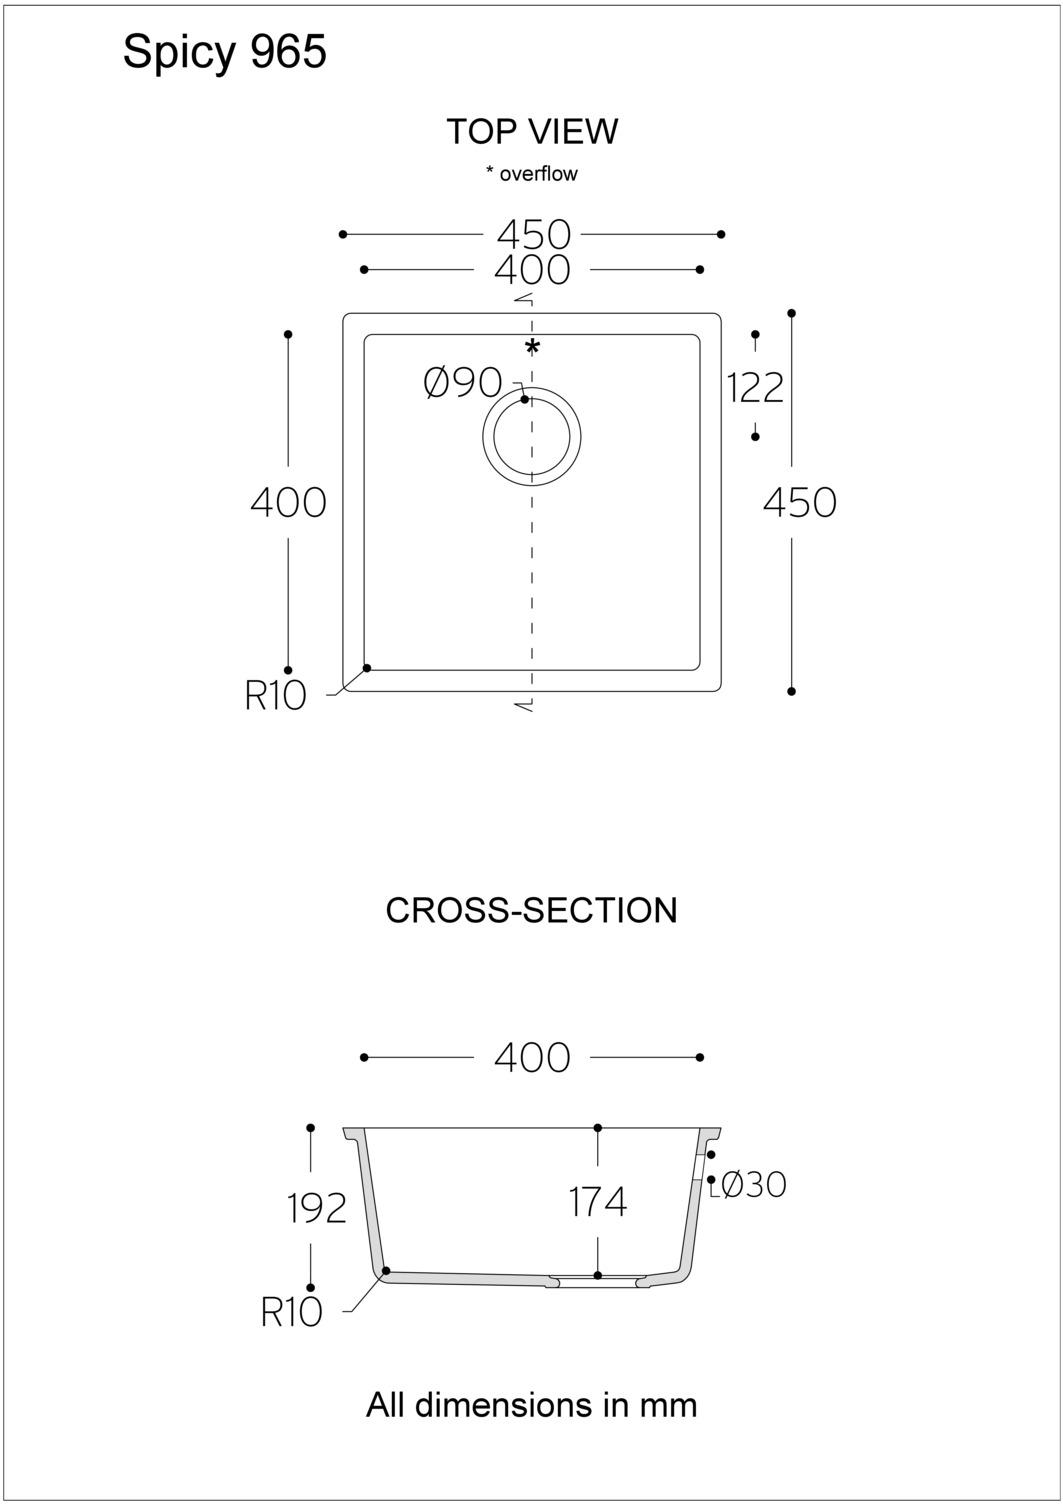 DUPONT_CORIAN_SPICY965_2D_PDF[0]